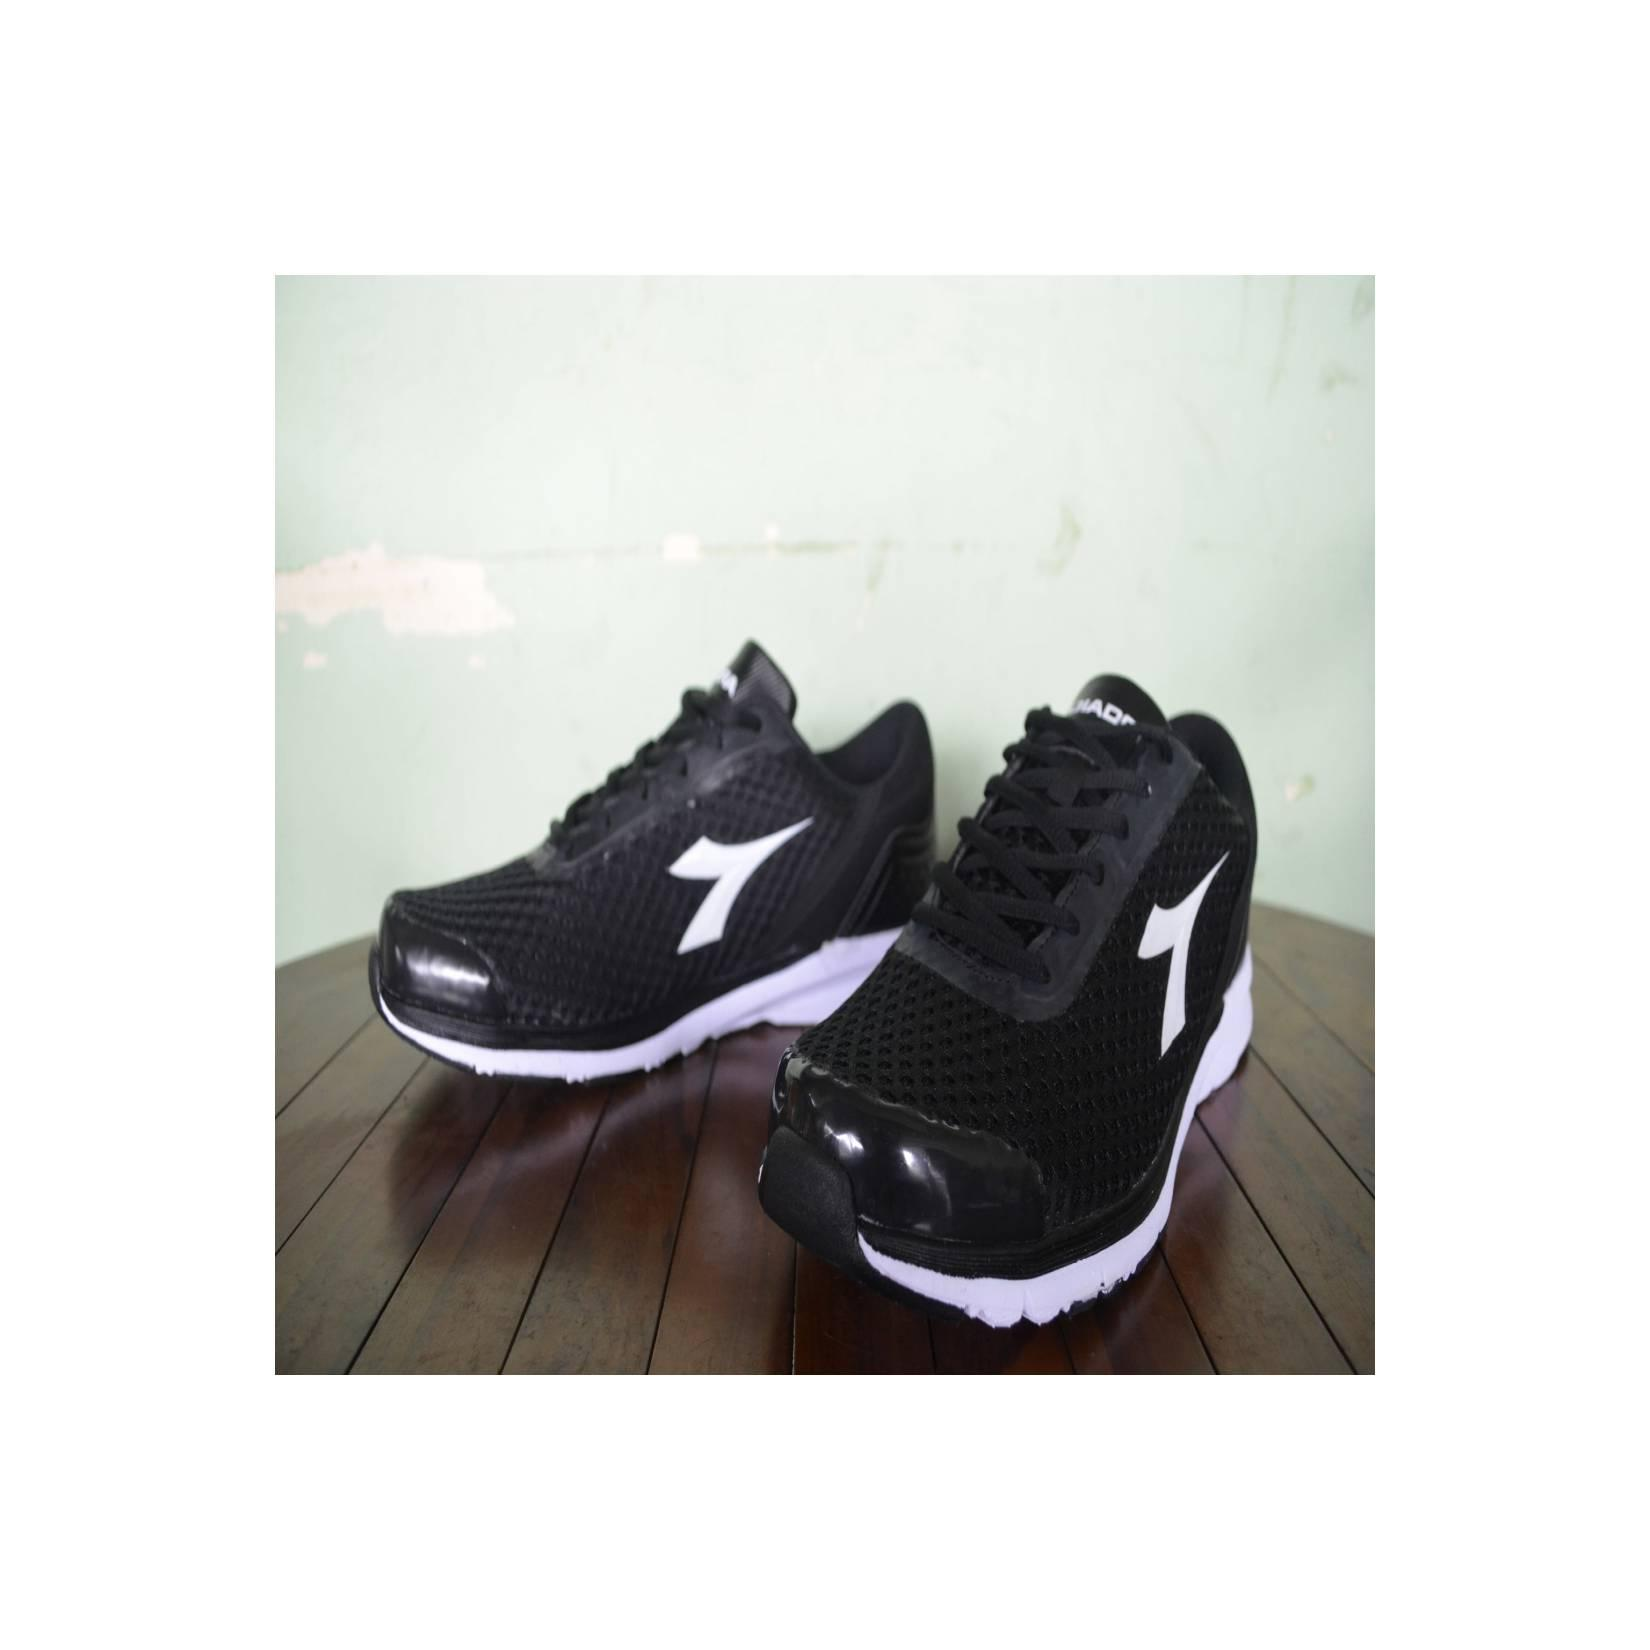 Sepatu Running / Olahraga Diadora Ensu Original, Murah (Not Nike,Puma)